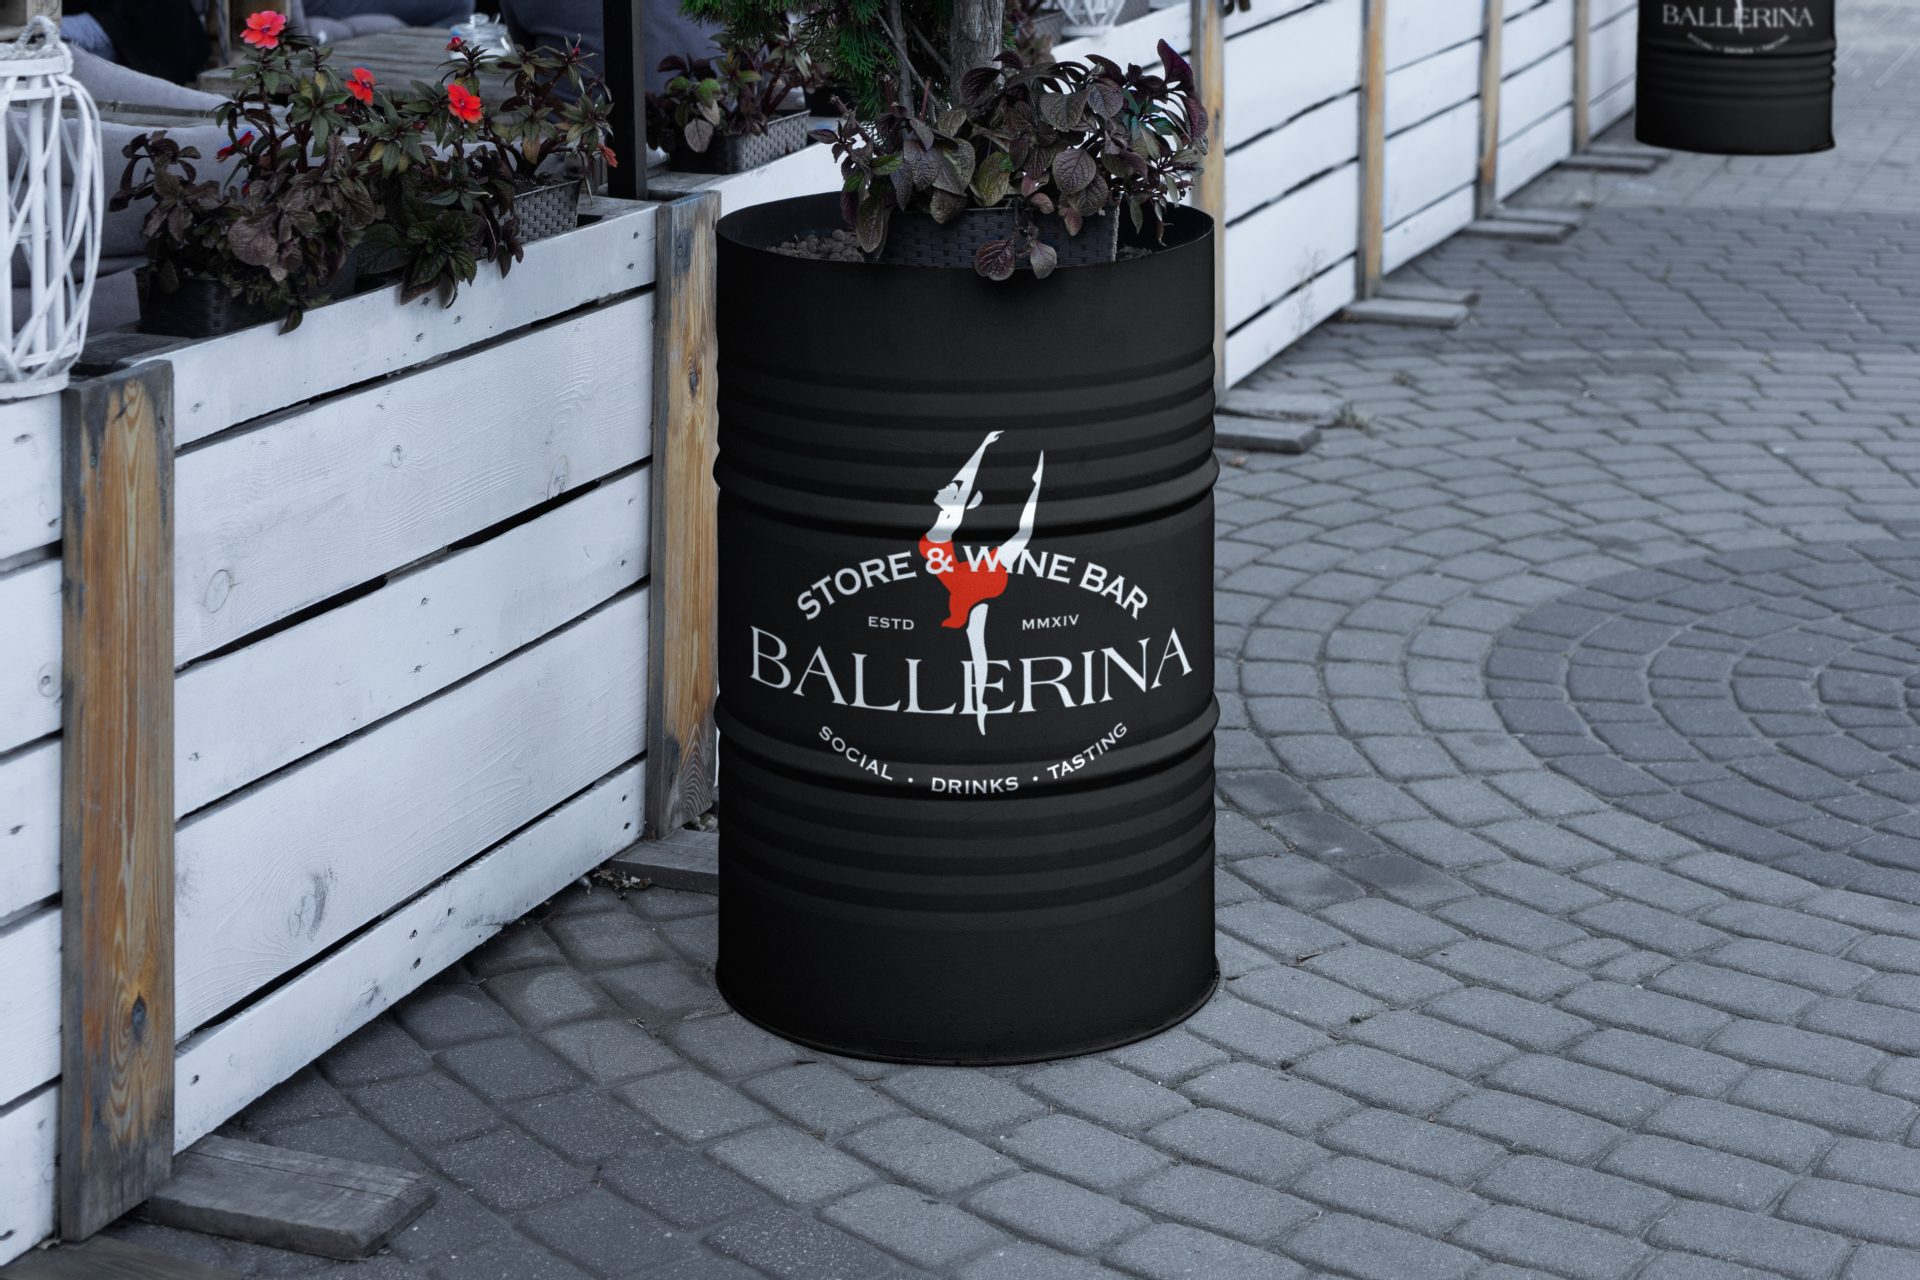 Ballerina Store & Wine Bar